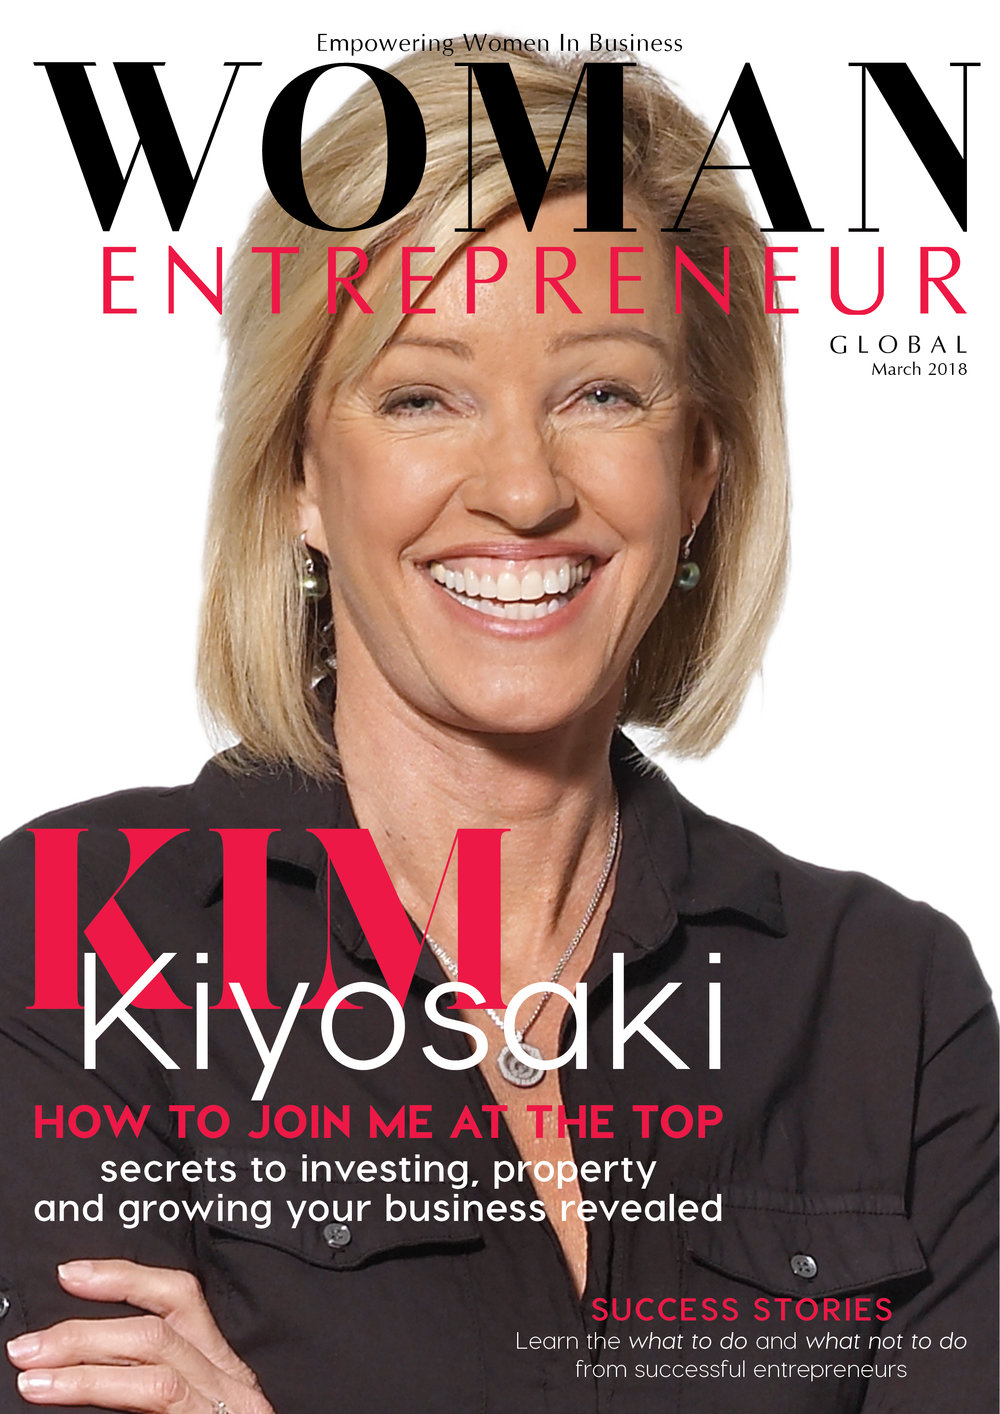 Kim Kiyosaki - Networth of over $500 million - Learn how Kim Kiyosaki, Co-Founder of the Richdad company & property mogul has build her empire